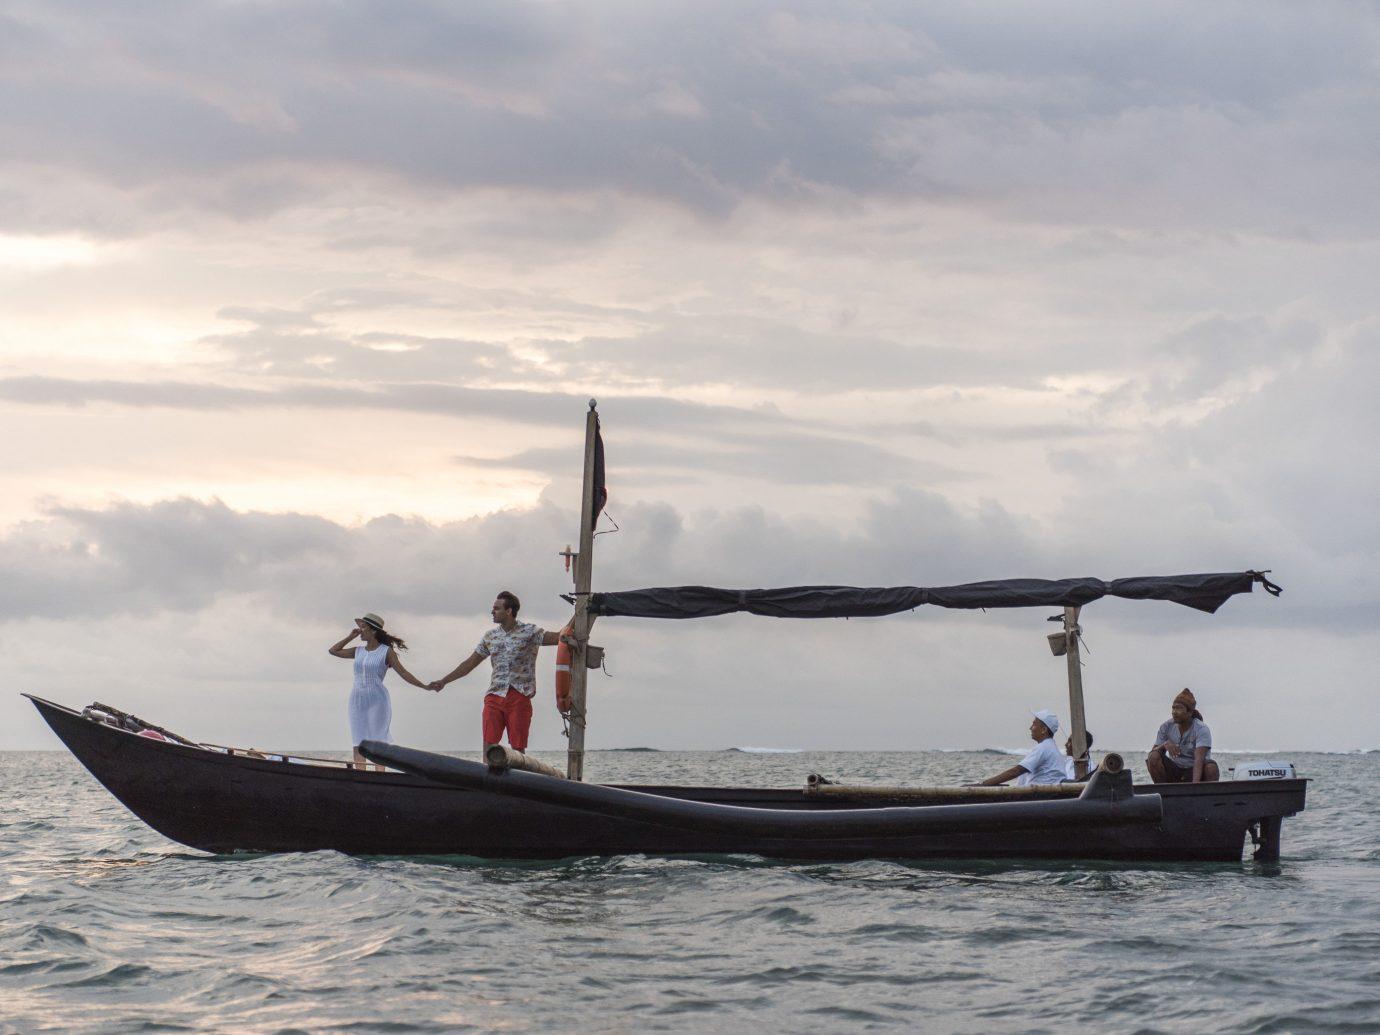 Hotels sky Boat water outdoor vehicle Sea watercraft fishing vessel boating transport bay sailing vessel